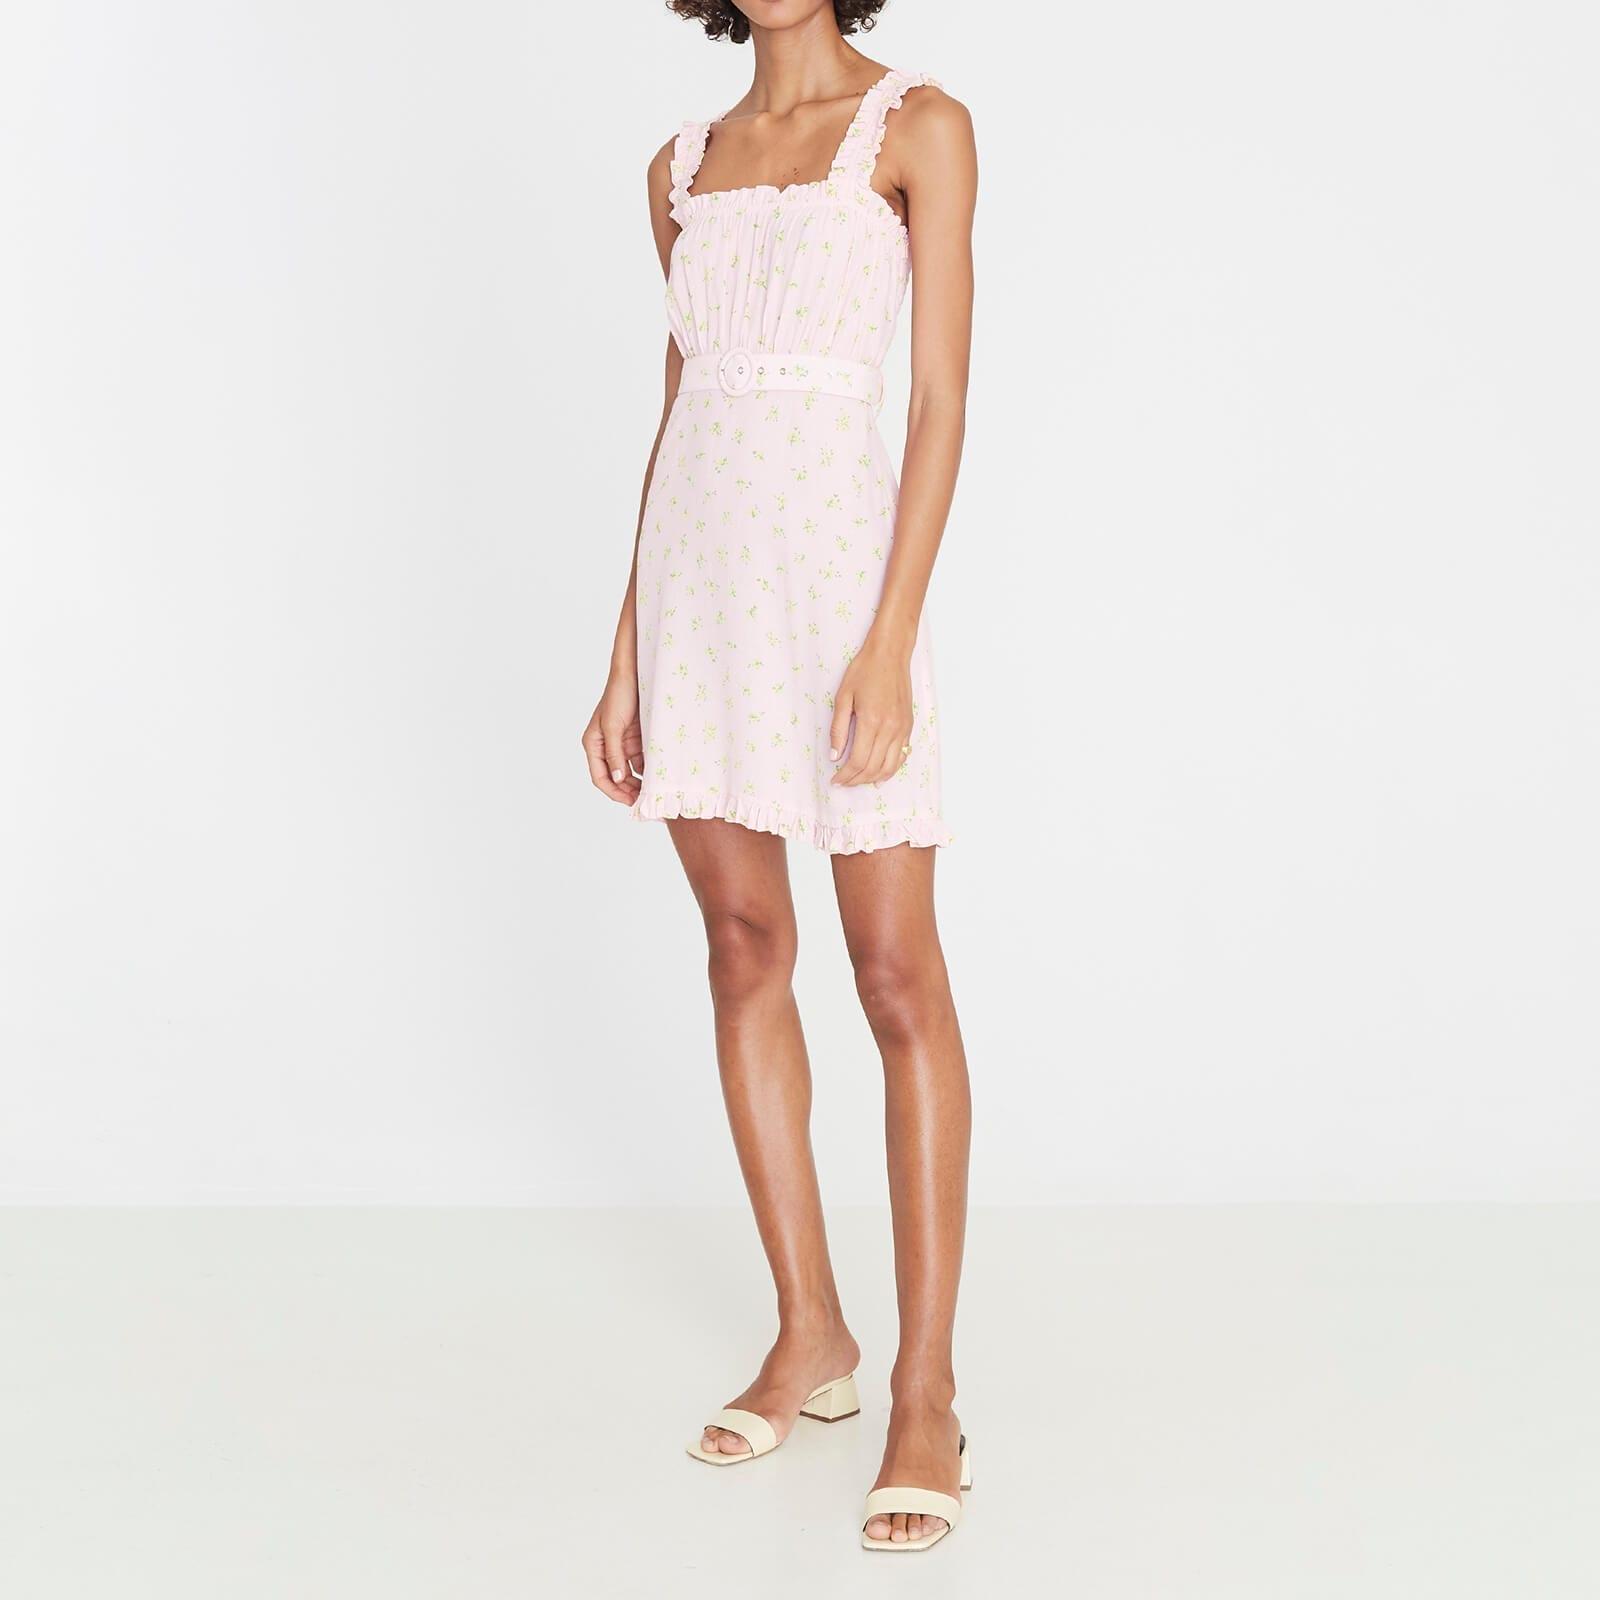 FAITHFULL THE BRAND Women's Mid Summer Mini Dress